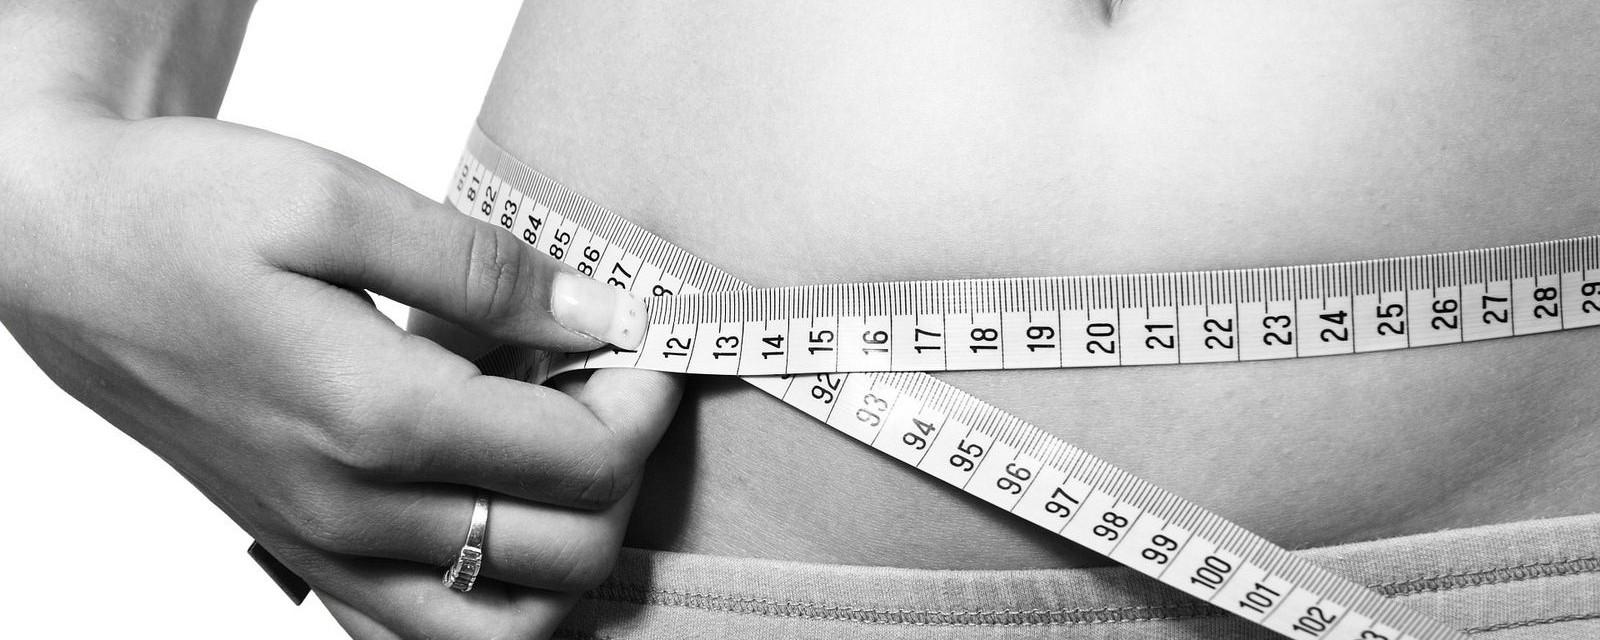 nina pierdere in greutate